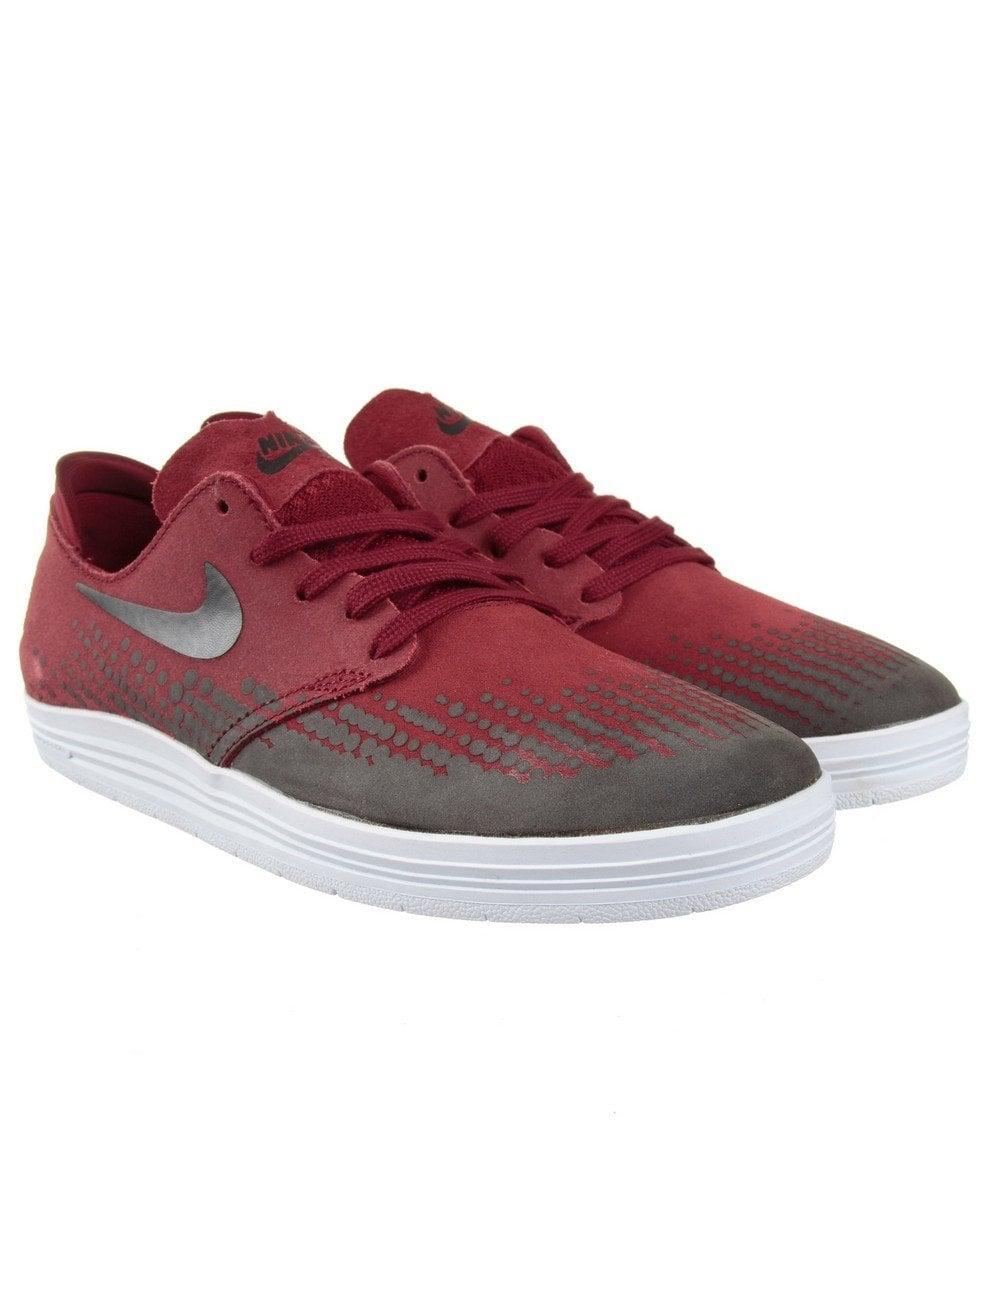 pick up 0decc 414f8 Nike SB Lunar One Shot Shoes - Team Red